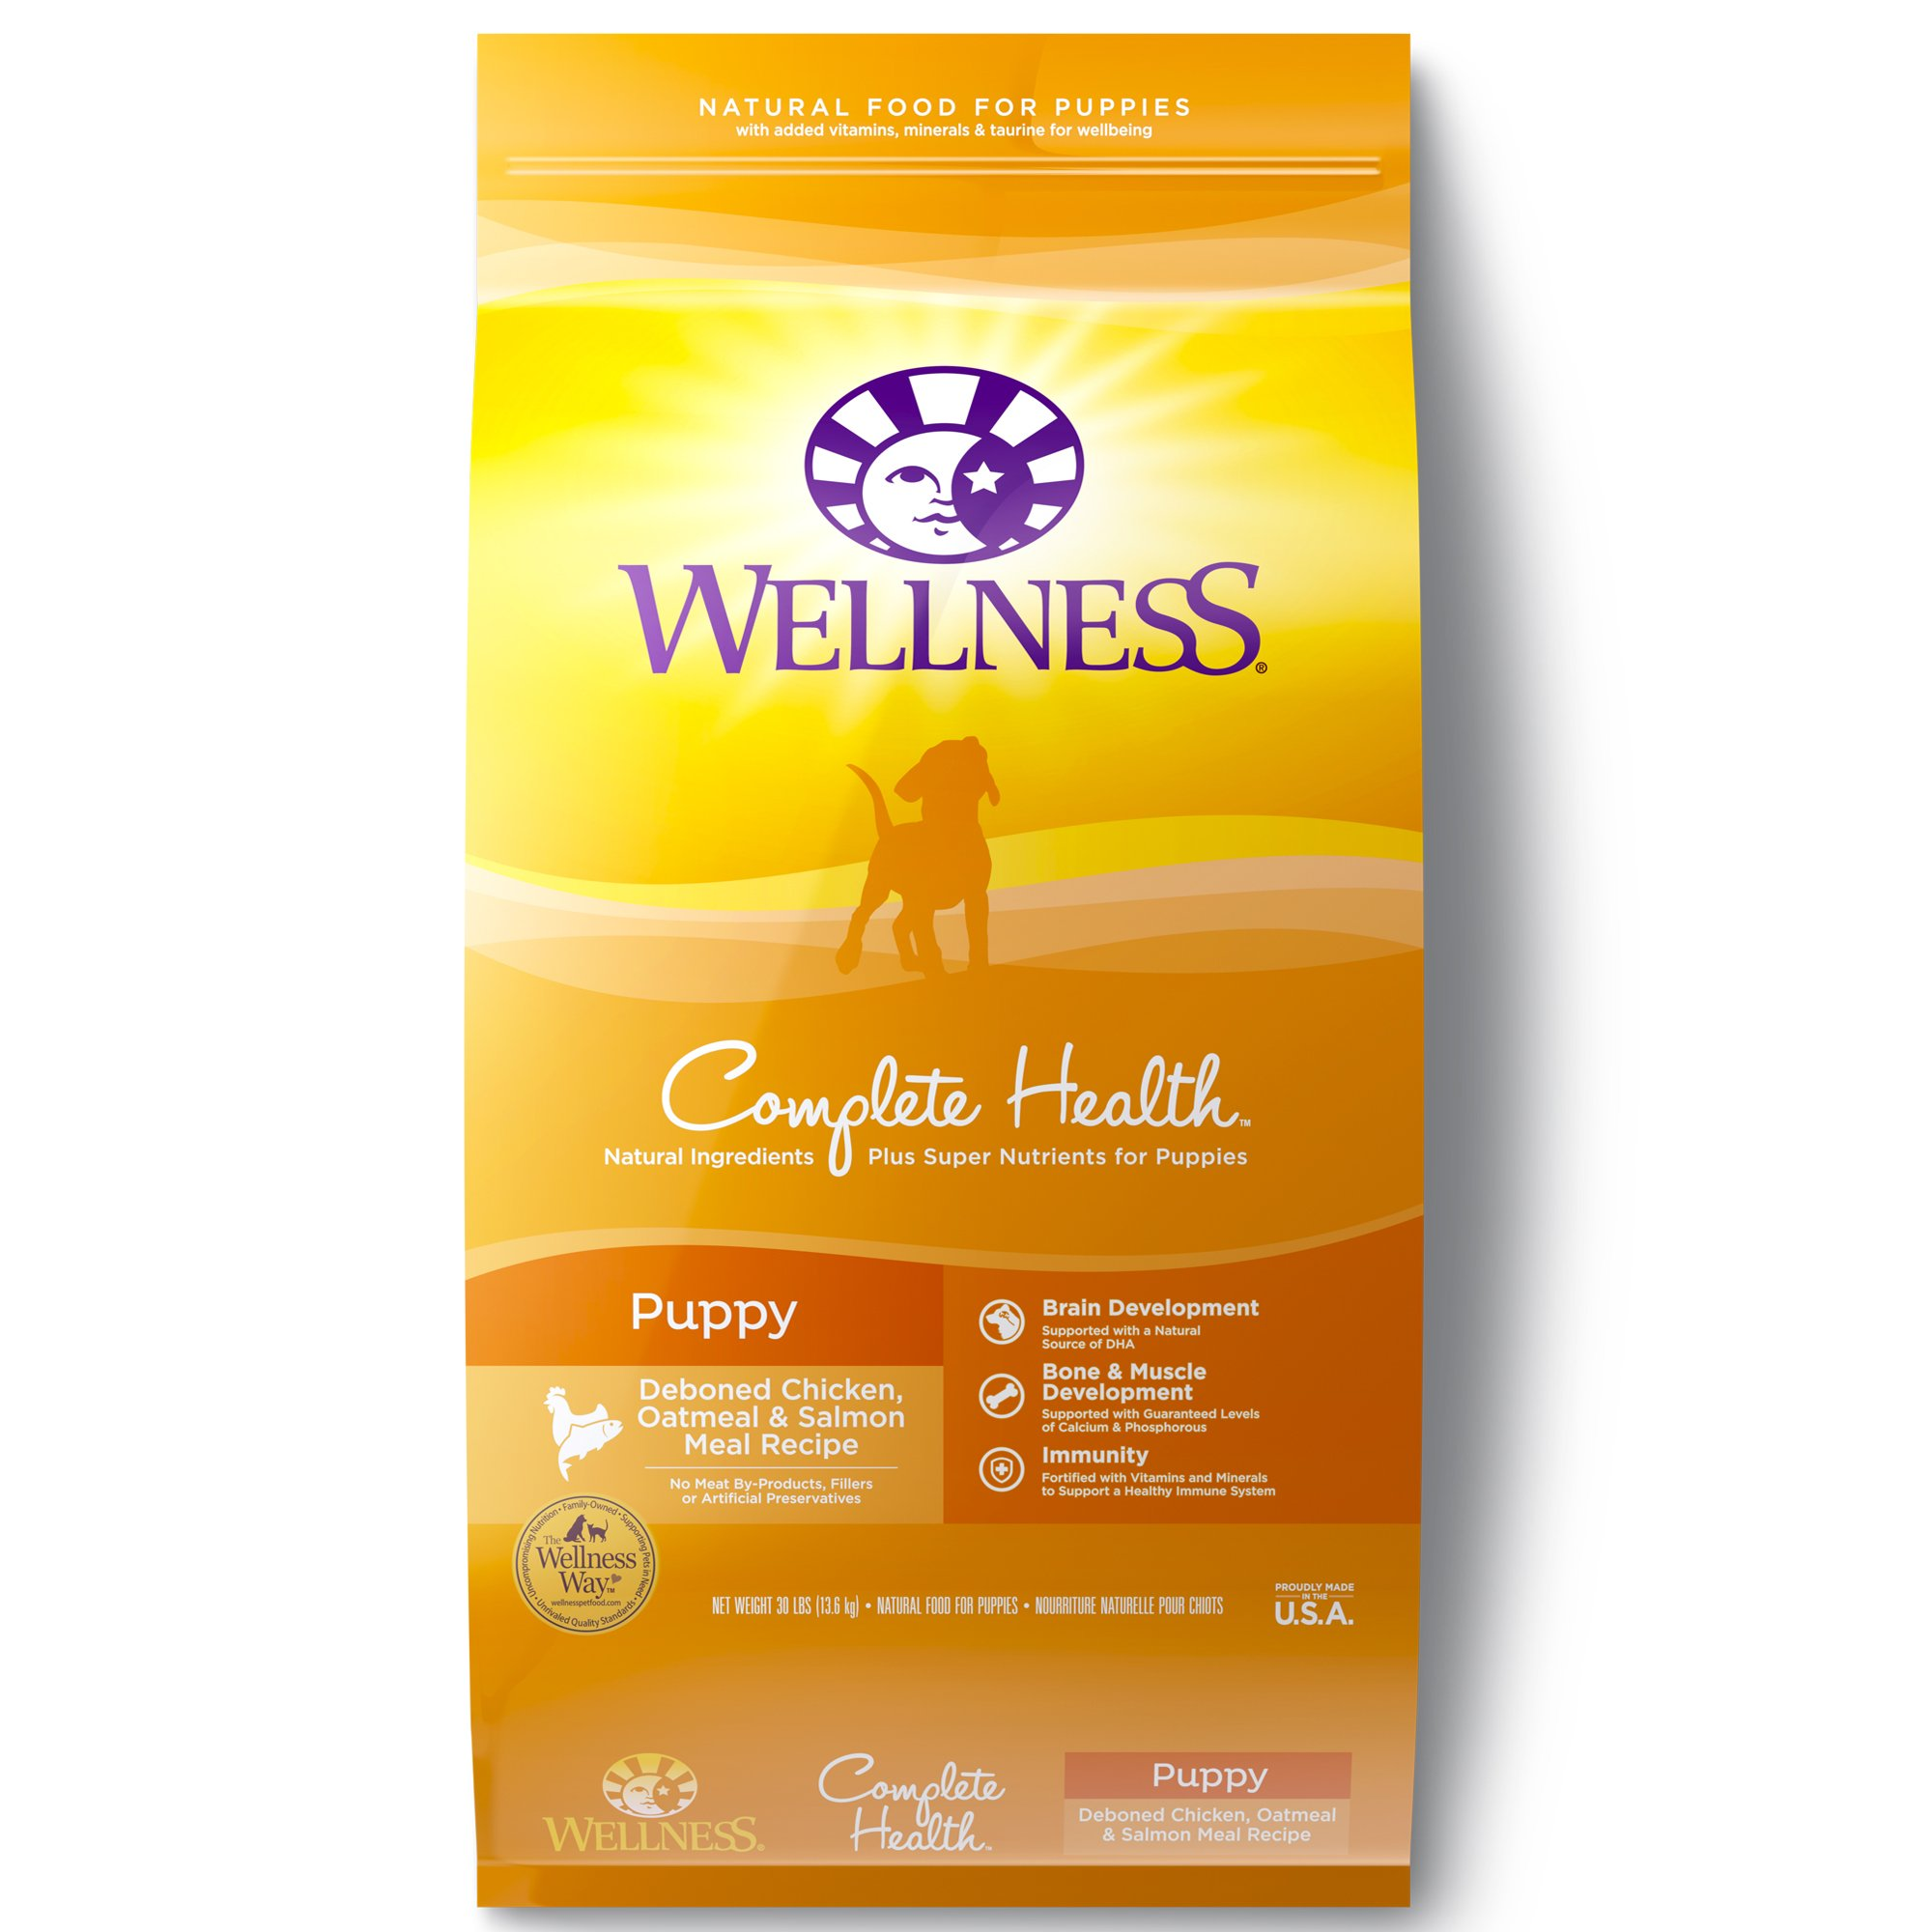 Wellness Complete Health Deboned Chicken Oatmeal & Salmon Meal Puppy Food